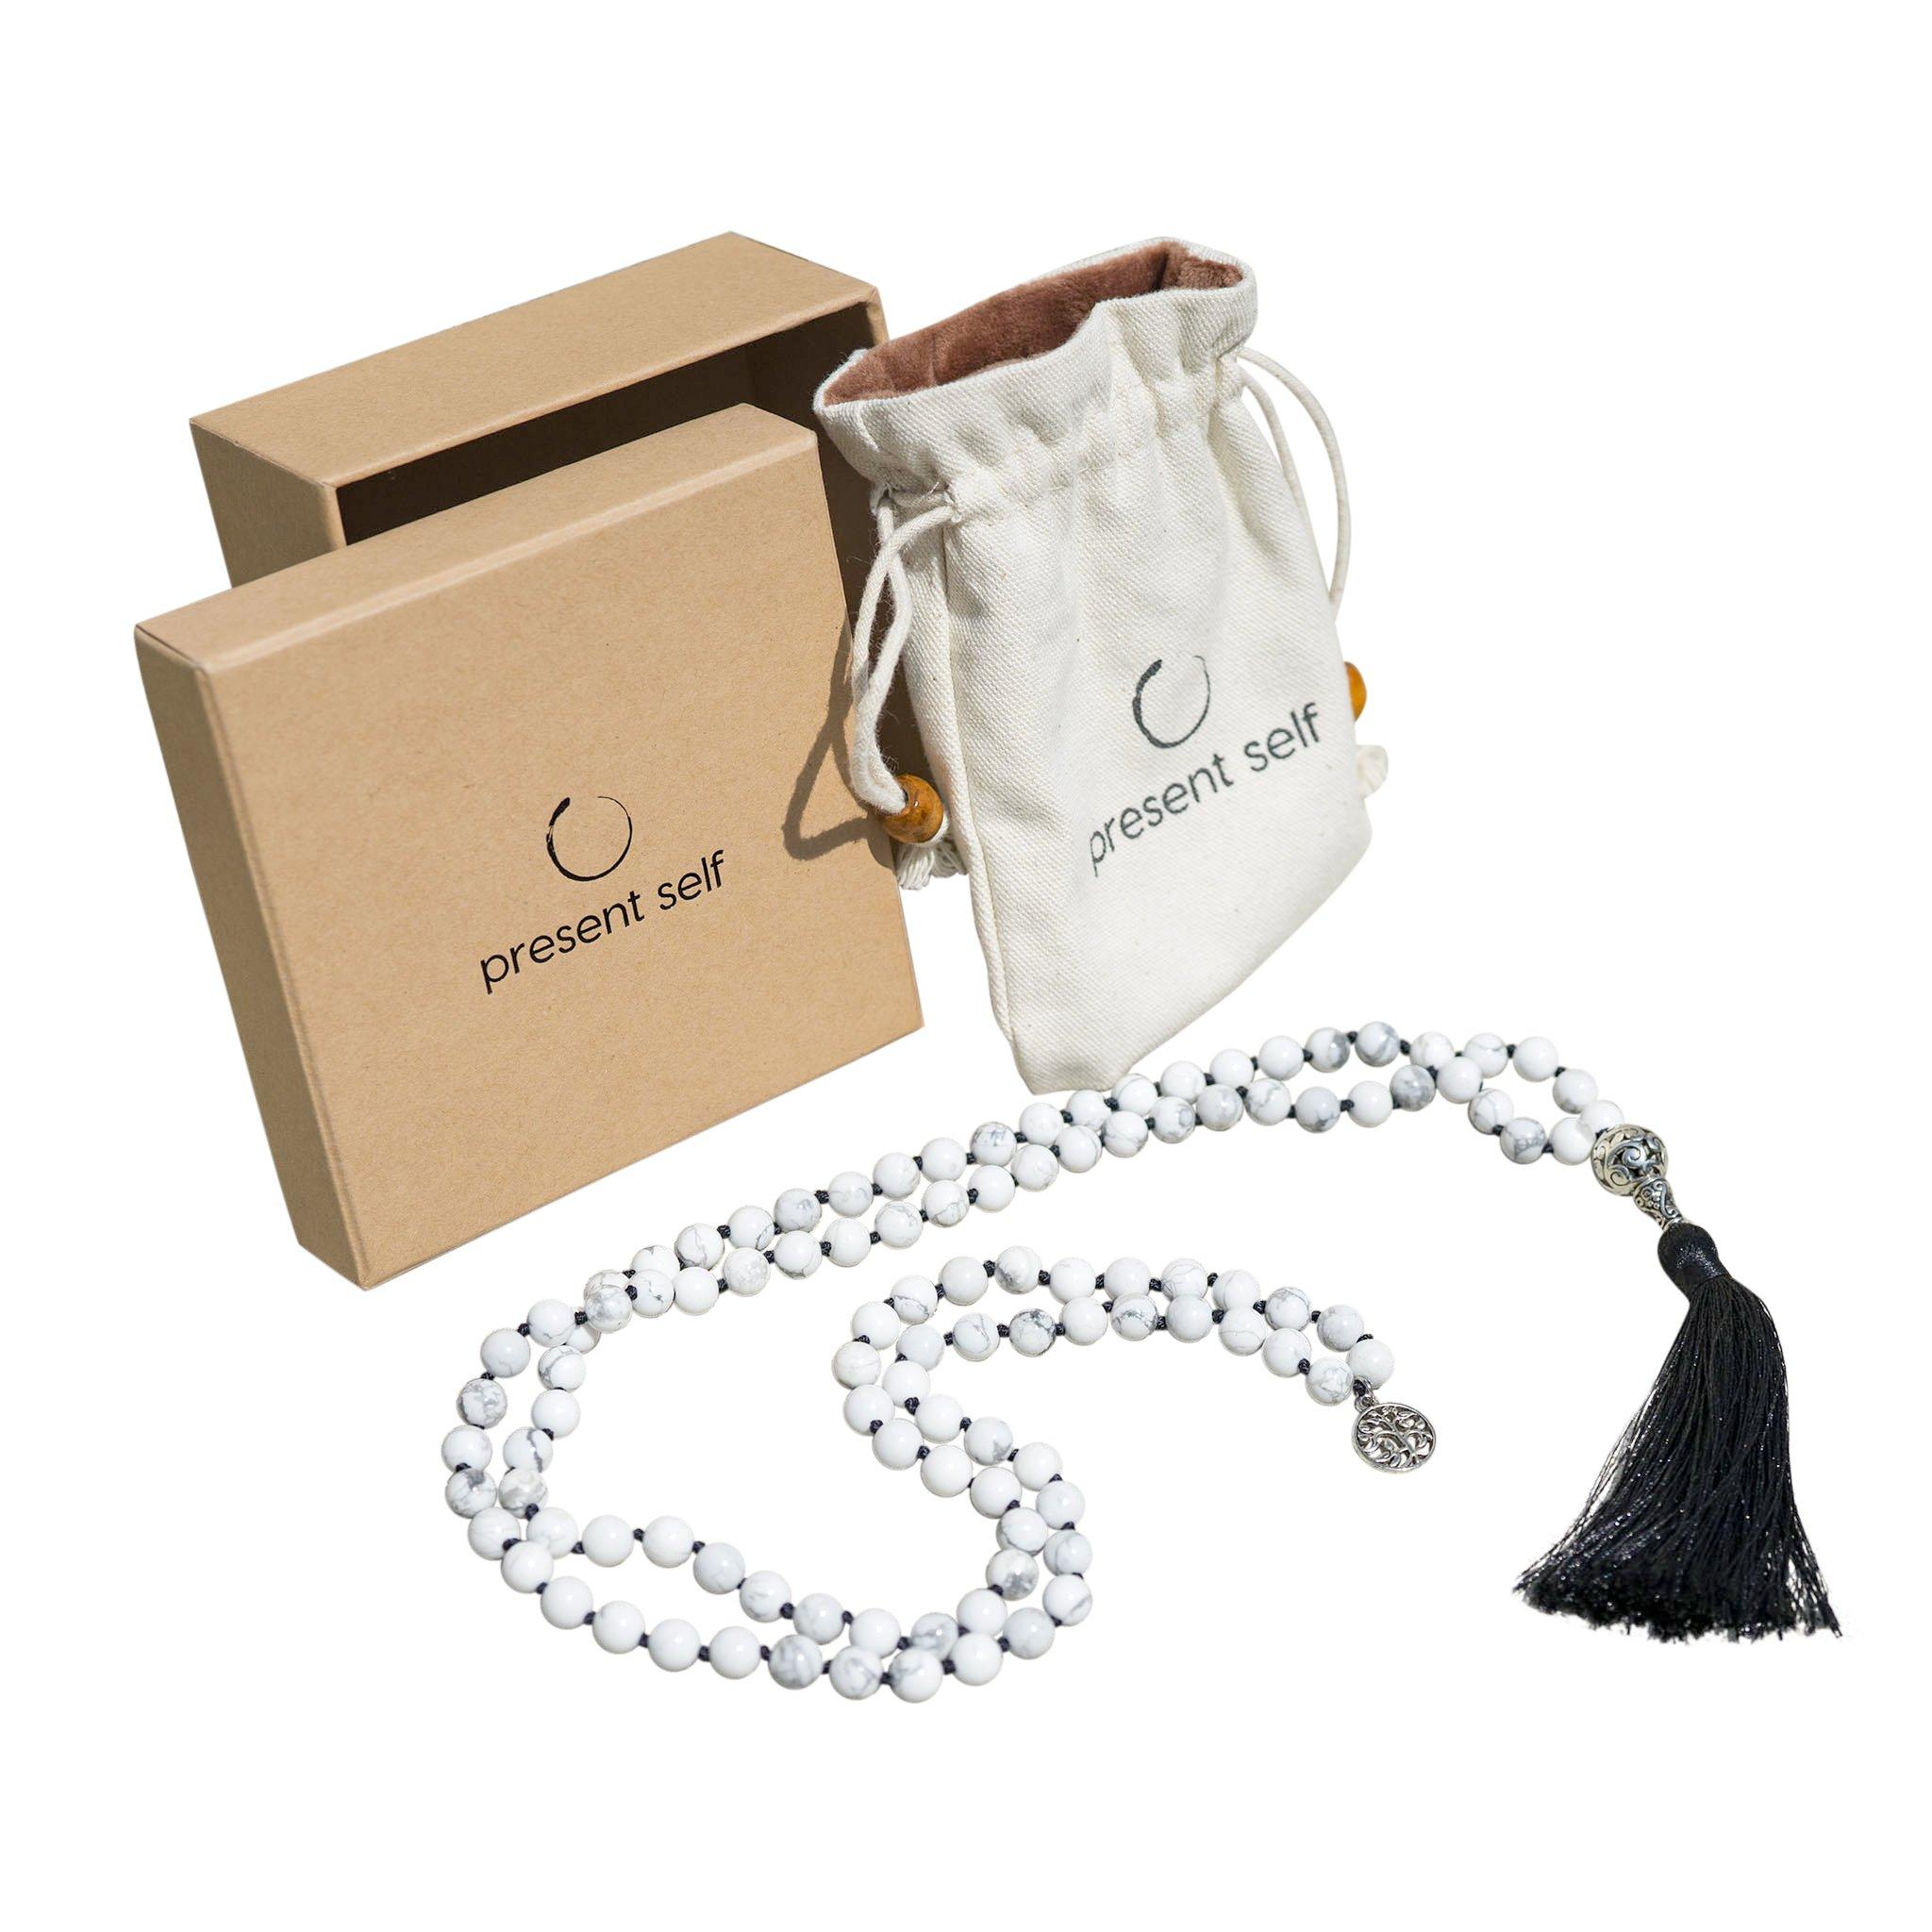 Japa Mala Beads Long Necklace - White Howlite Tassel Necklace - Buddha Necklace - Meditation Beads - Tibetan Prayer Beads by Present Self